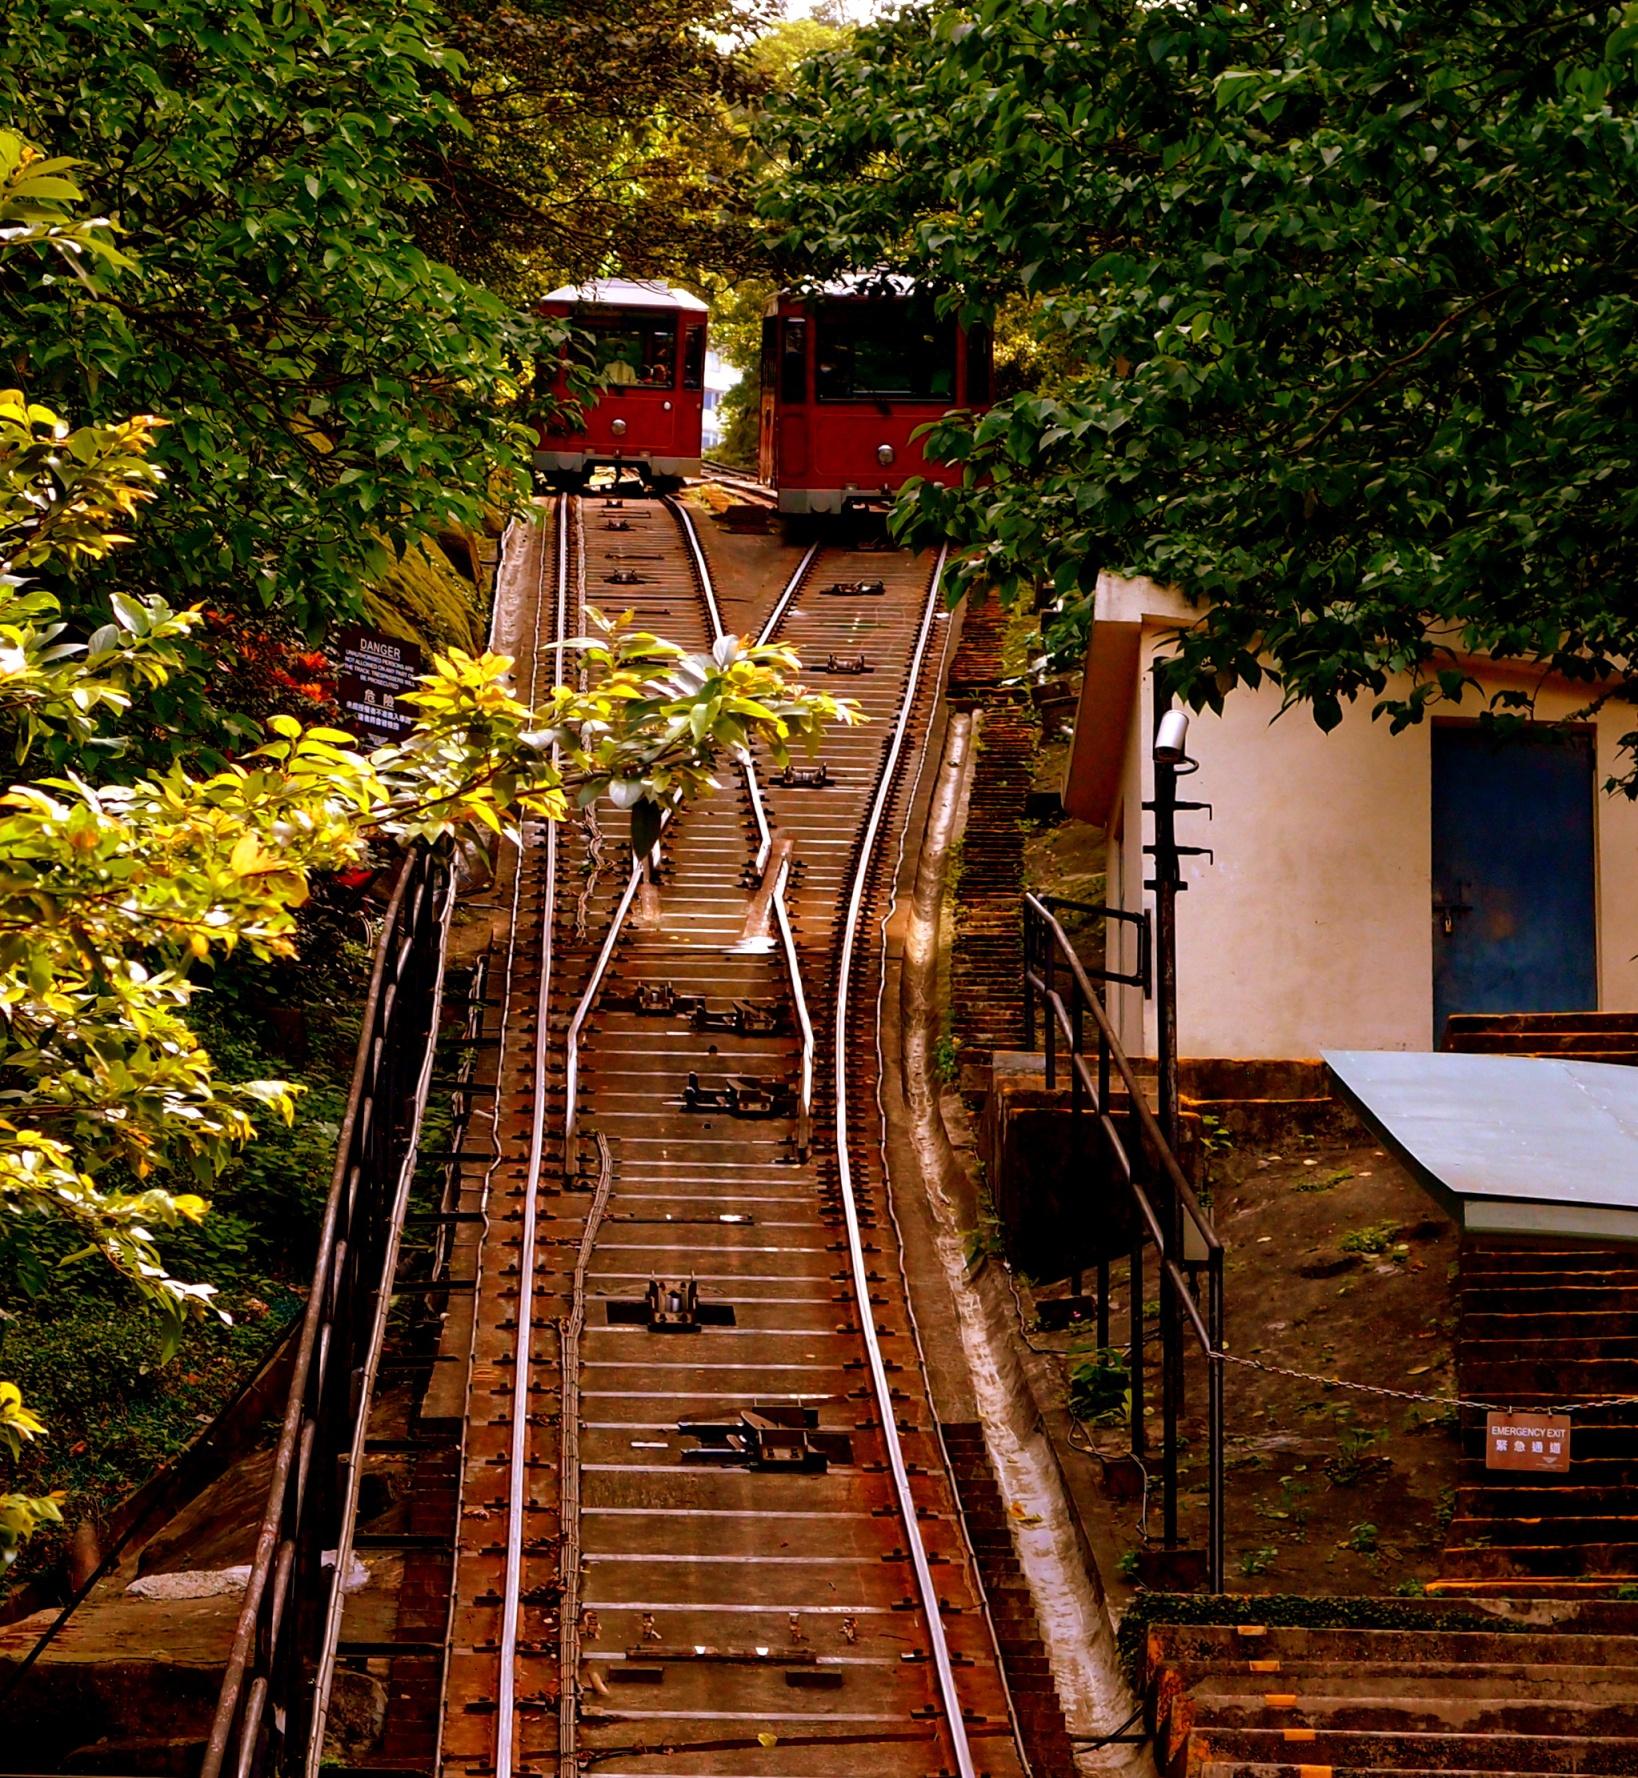 May Road - the Peak Tram crossing place